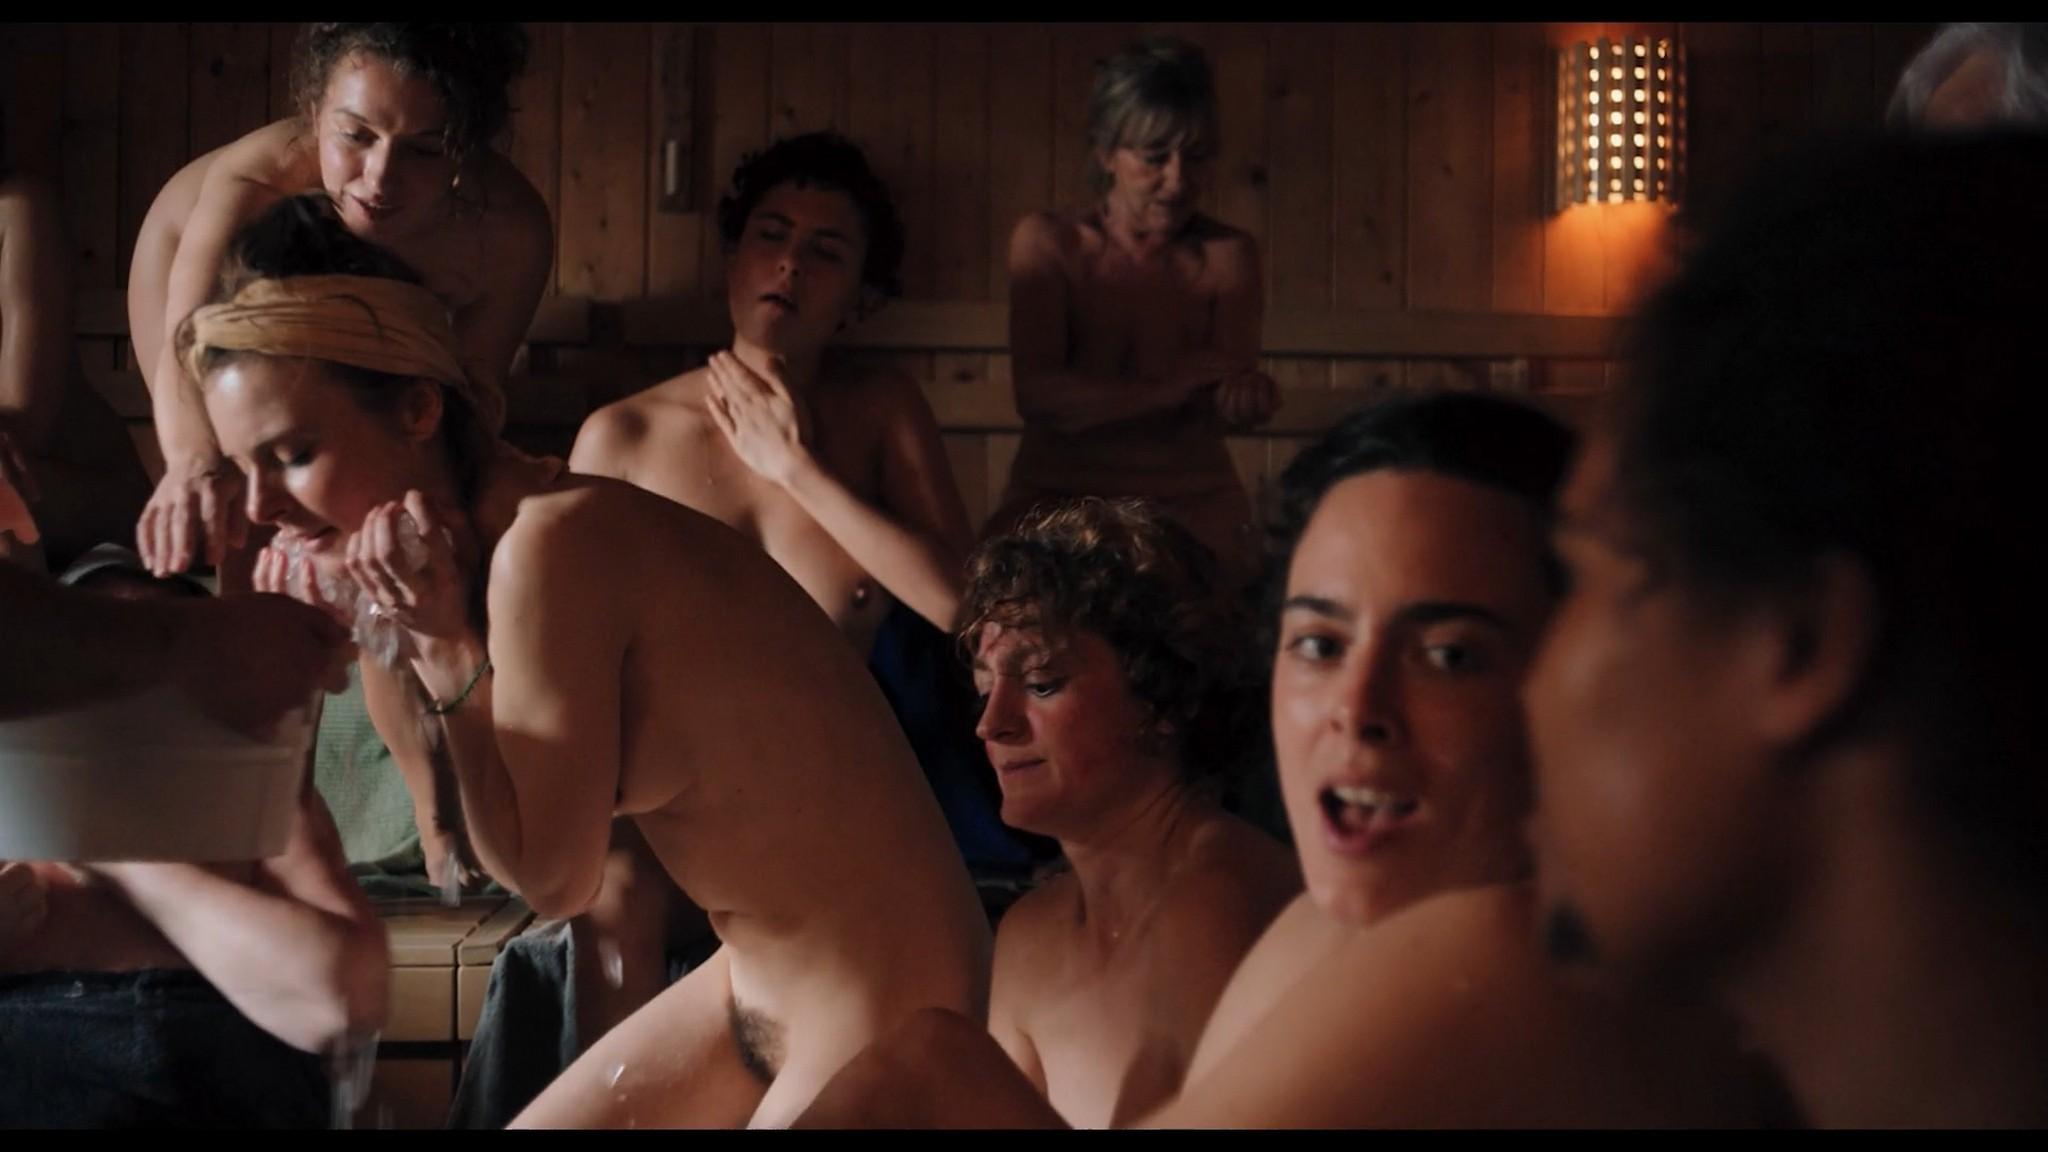 Antonia Bill nude full frontal Amanda da Gloria Helene Blechinger and others nude too Hitzig Ein Saunagang DE 2021 1080p 10